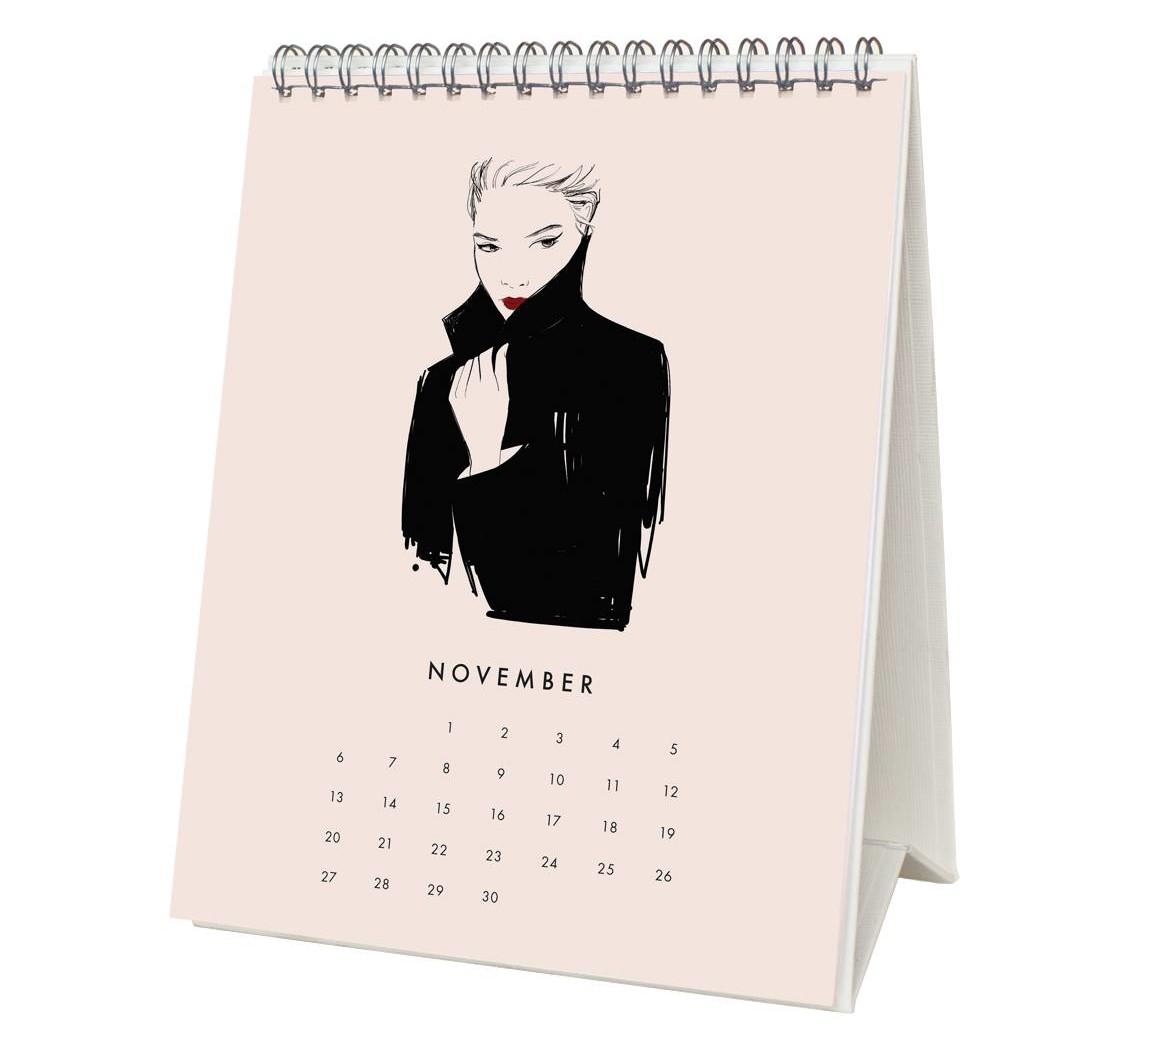 Garance Dore 2016 Desk Calendar - November